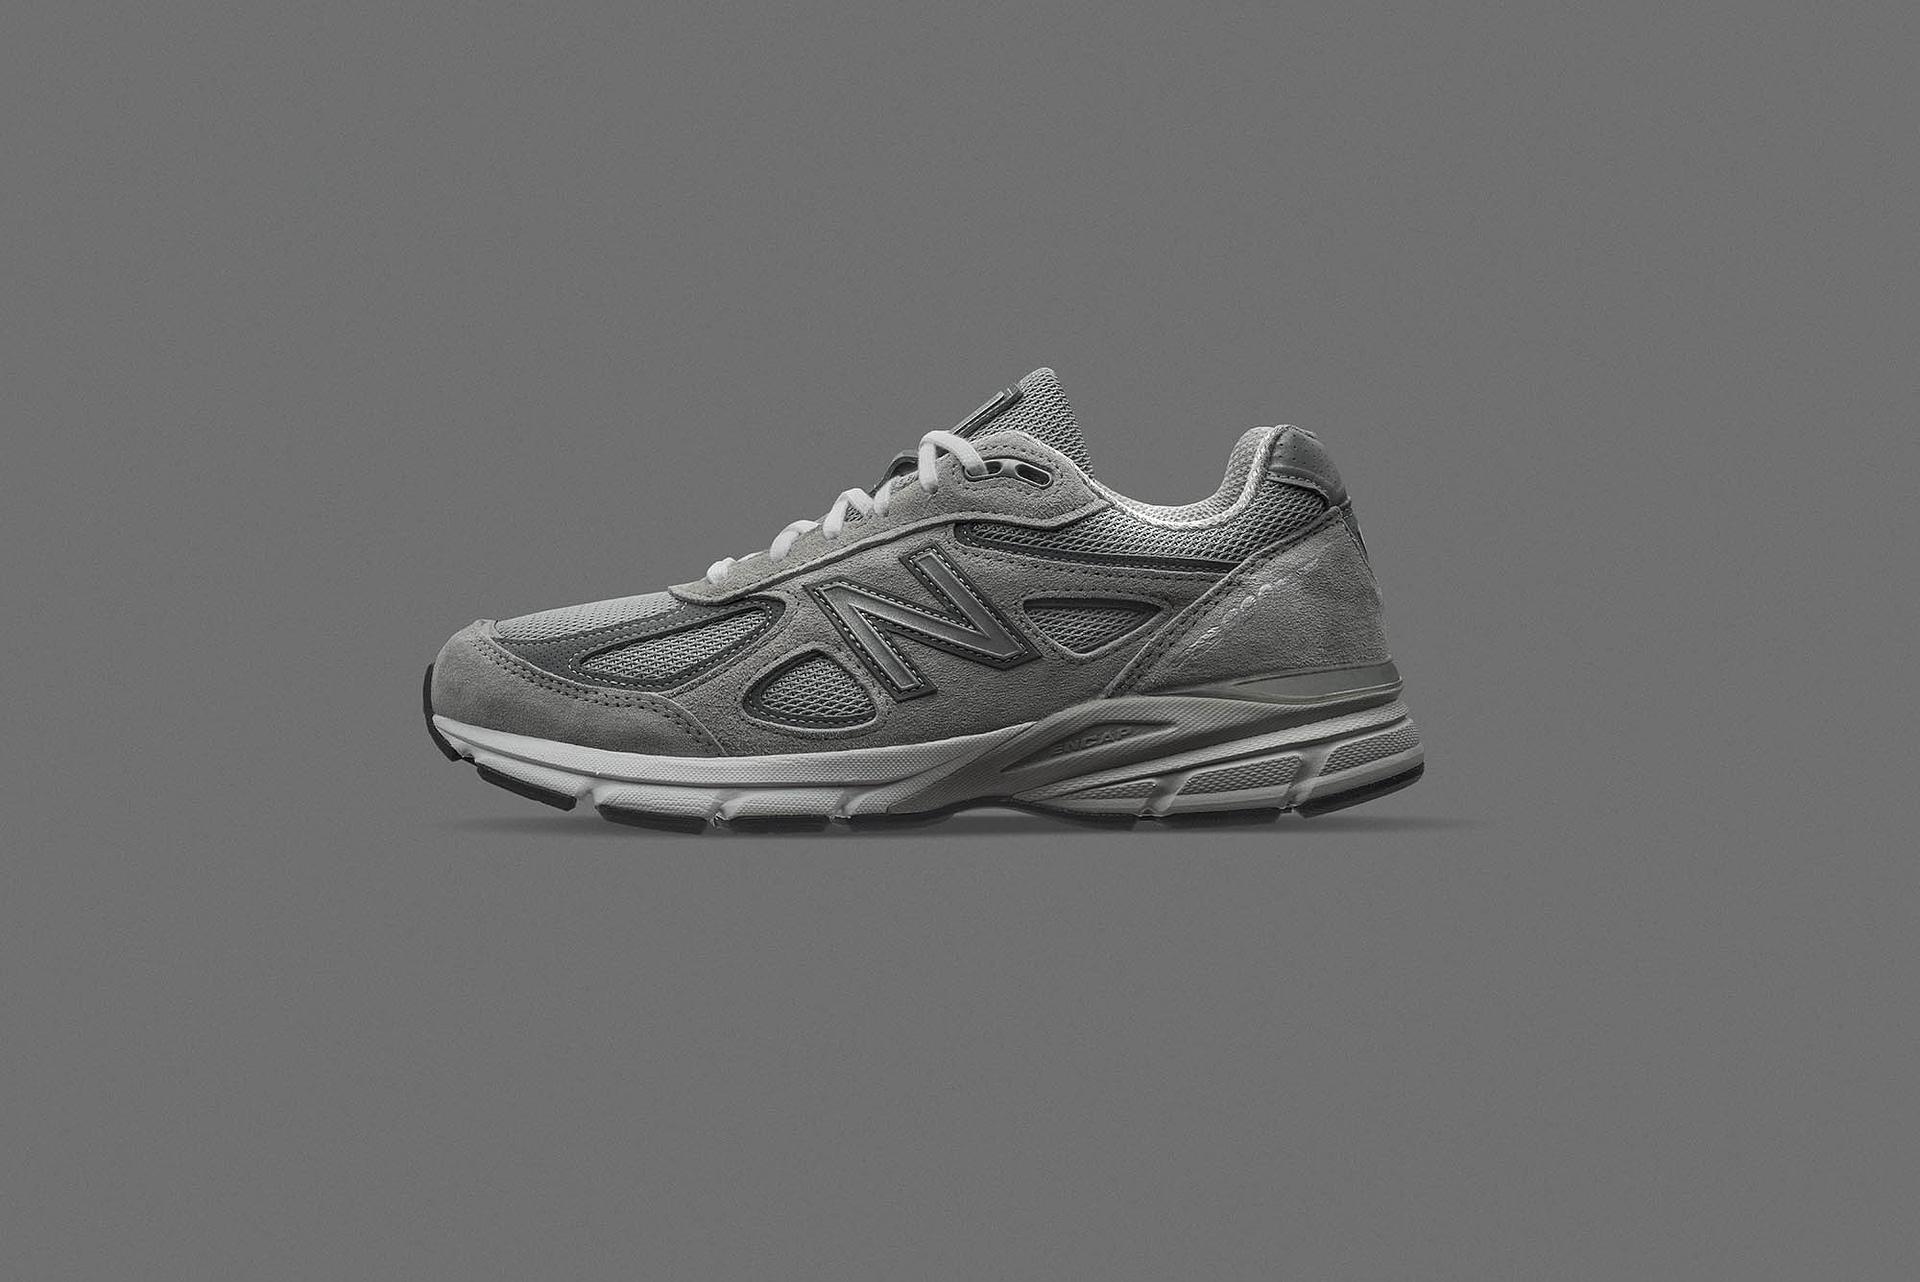 new balance 990v4 lifestyle running shoe photographed on a grey background